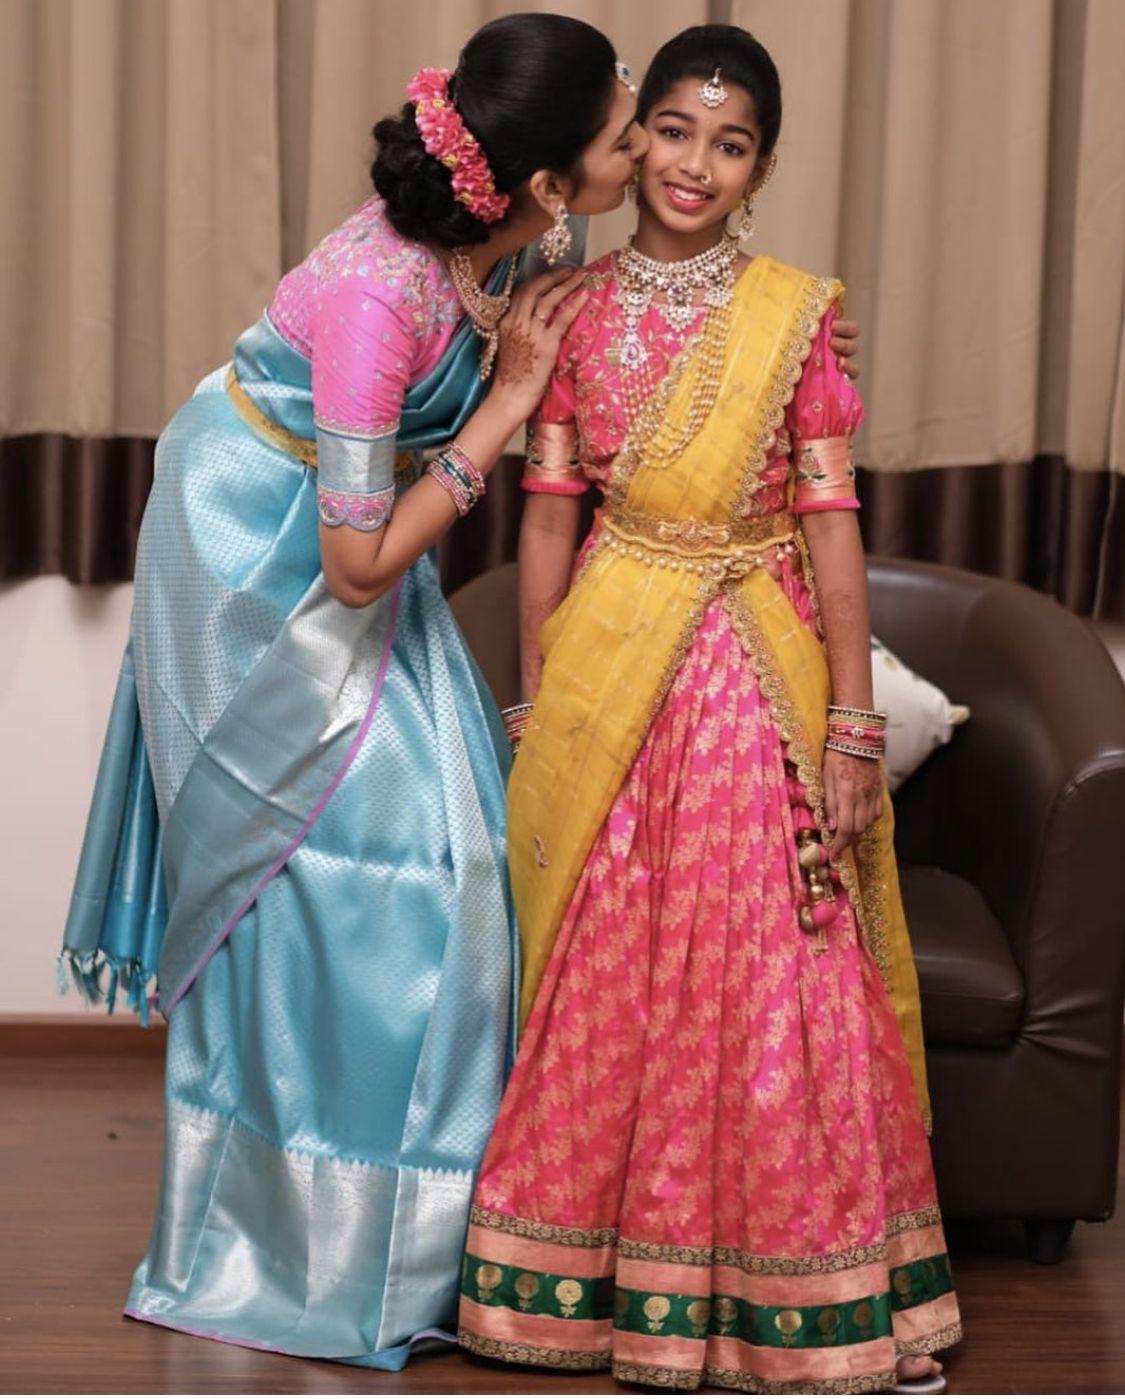 Pin By Manjula Priyadarshini On Blouses In 2020 Half Saree Designs Kids Blouse Designs Kids Designer Dresses